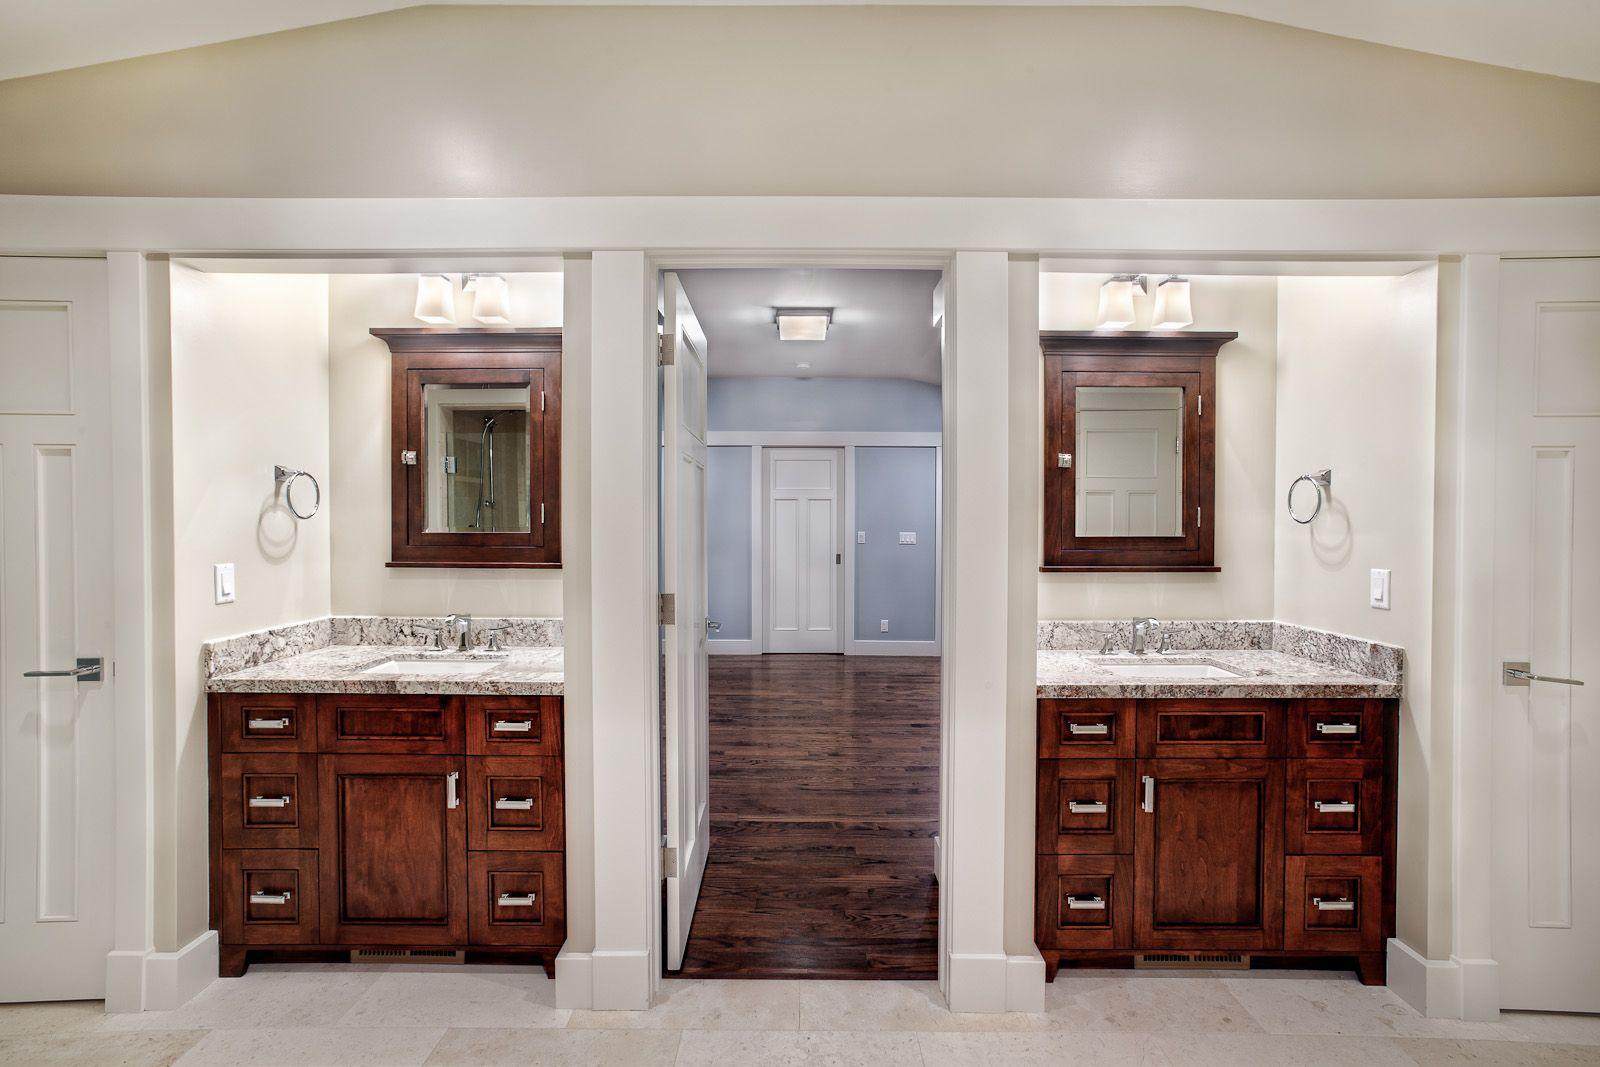 bathroom cabinets split double vanity bathroom griffin on custom bathroom vanity plans id=21758